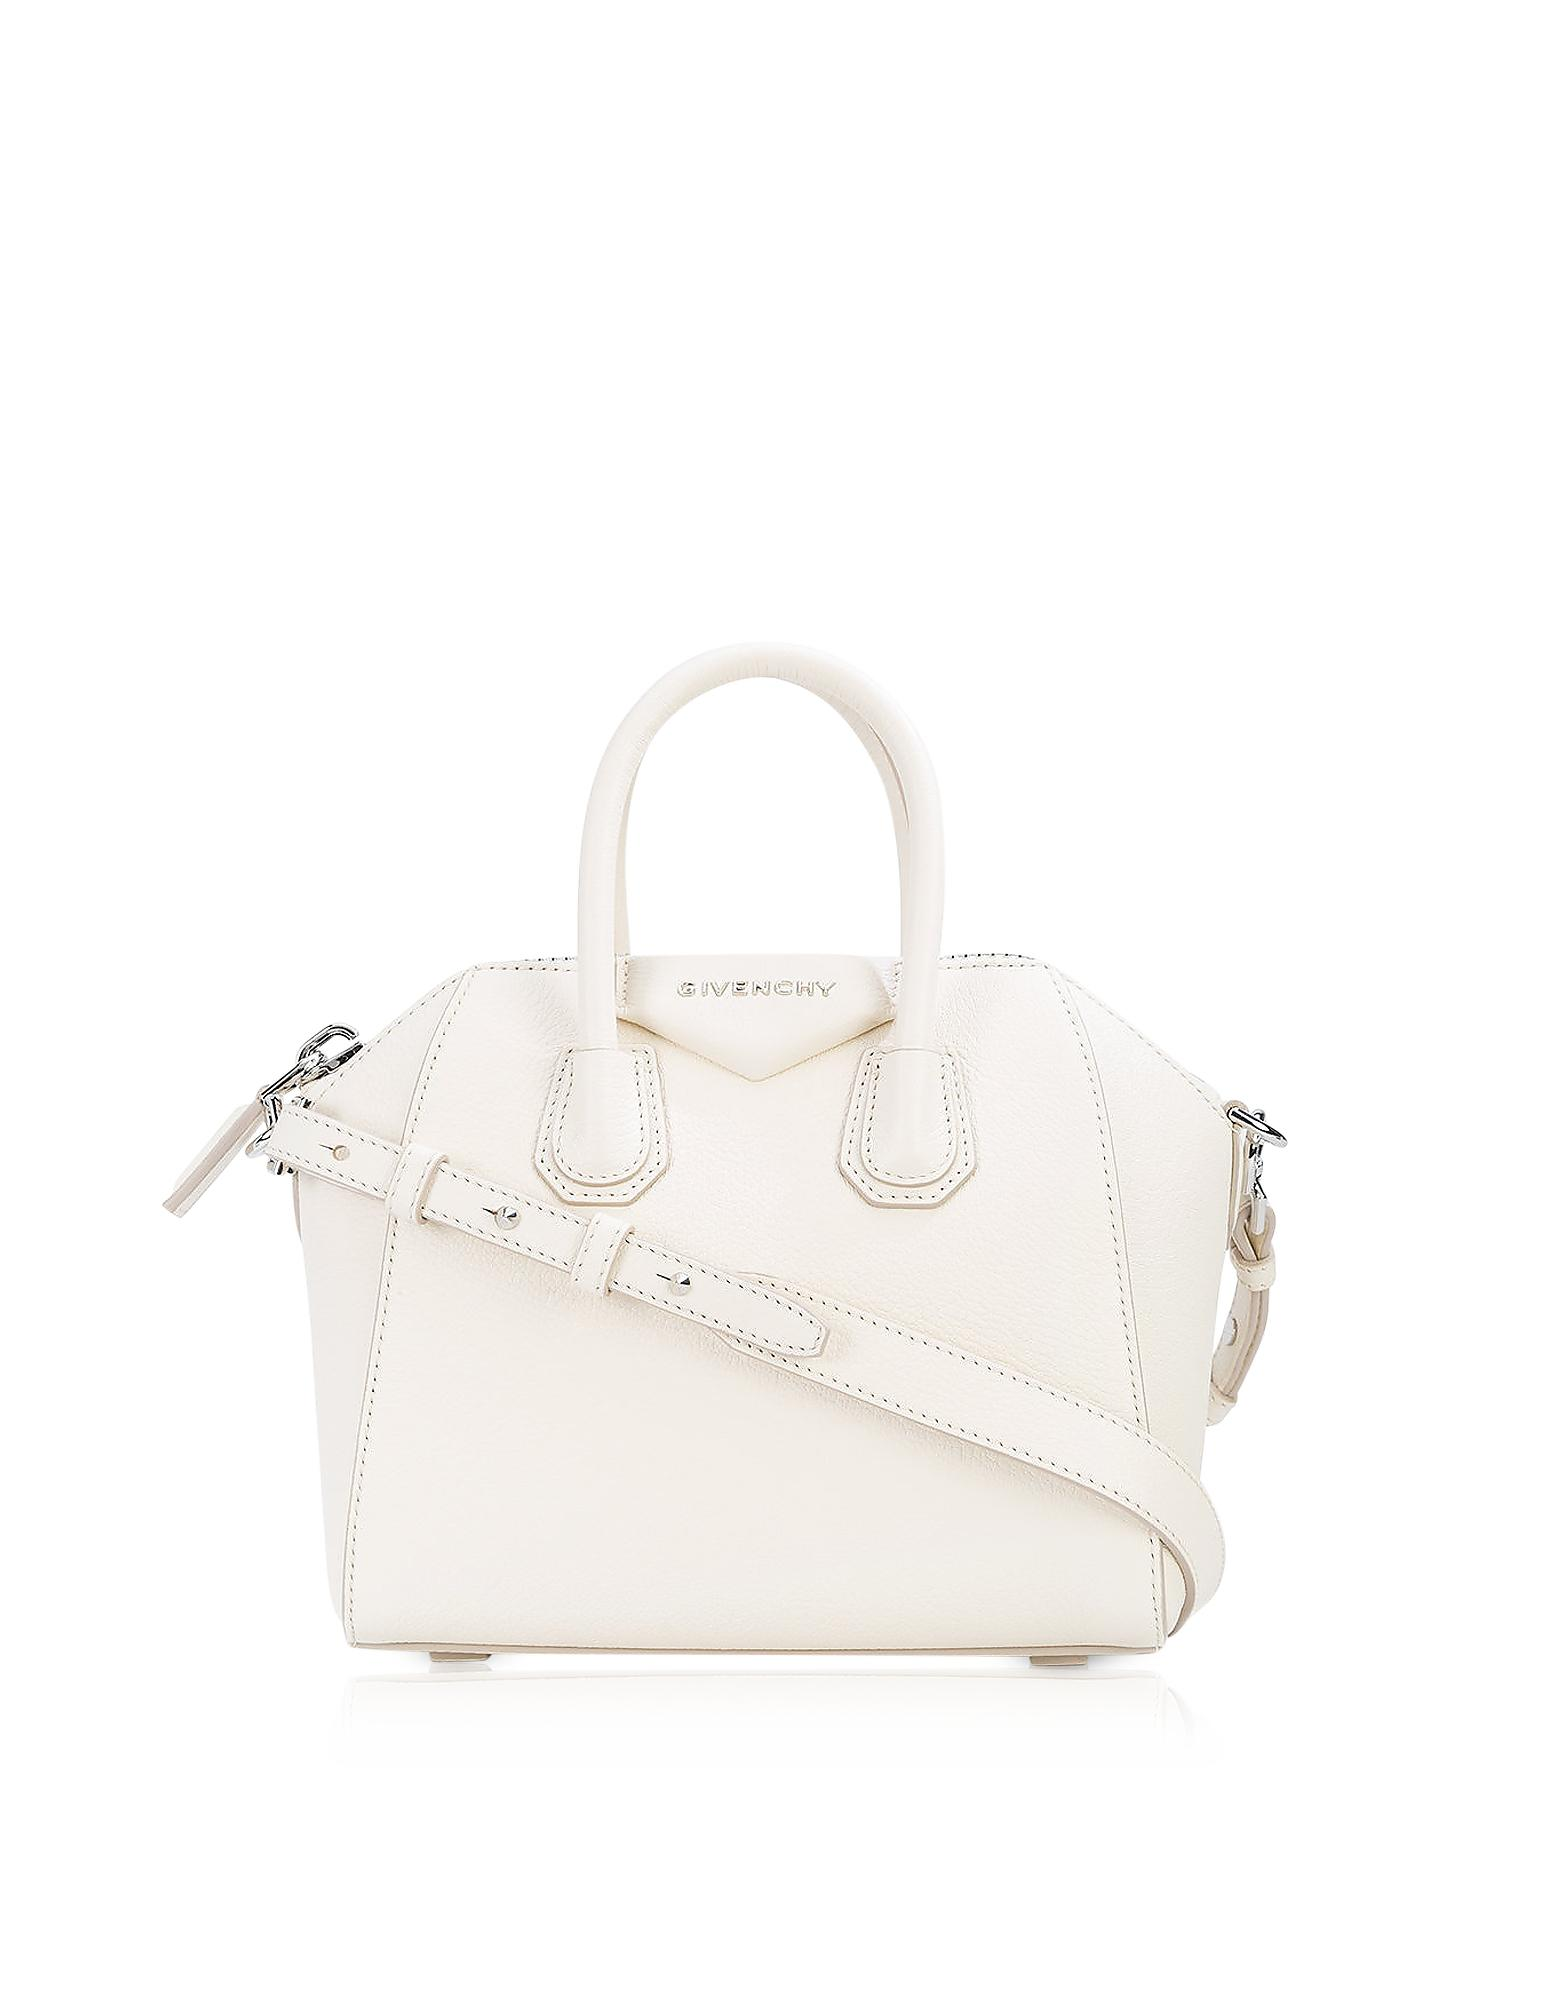 Givenchy Antigona Mini Off White Leather Satchel Bag in White - Lyst 65f9ce37ff123